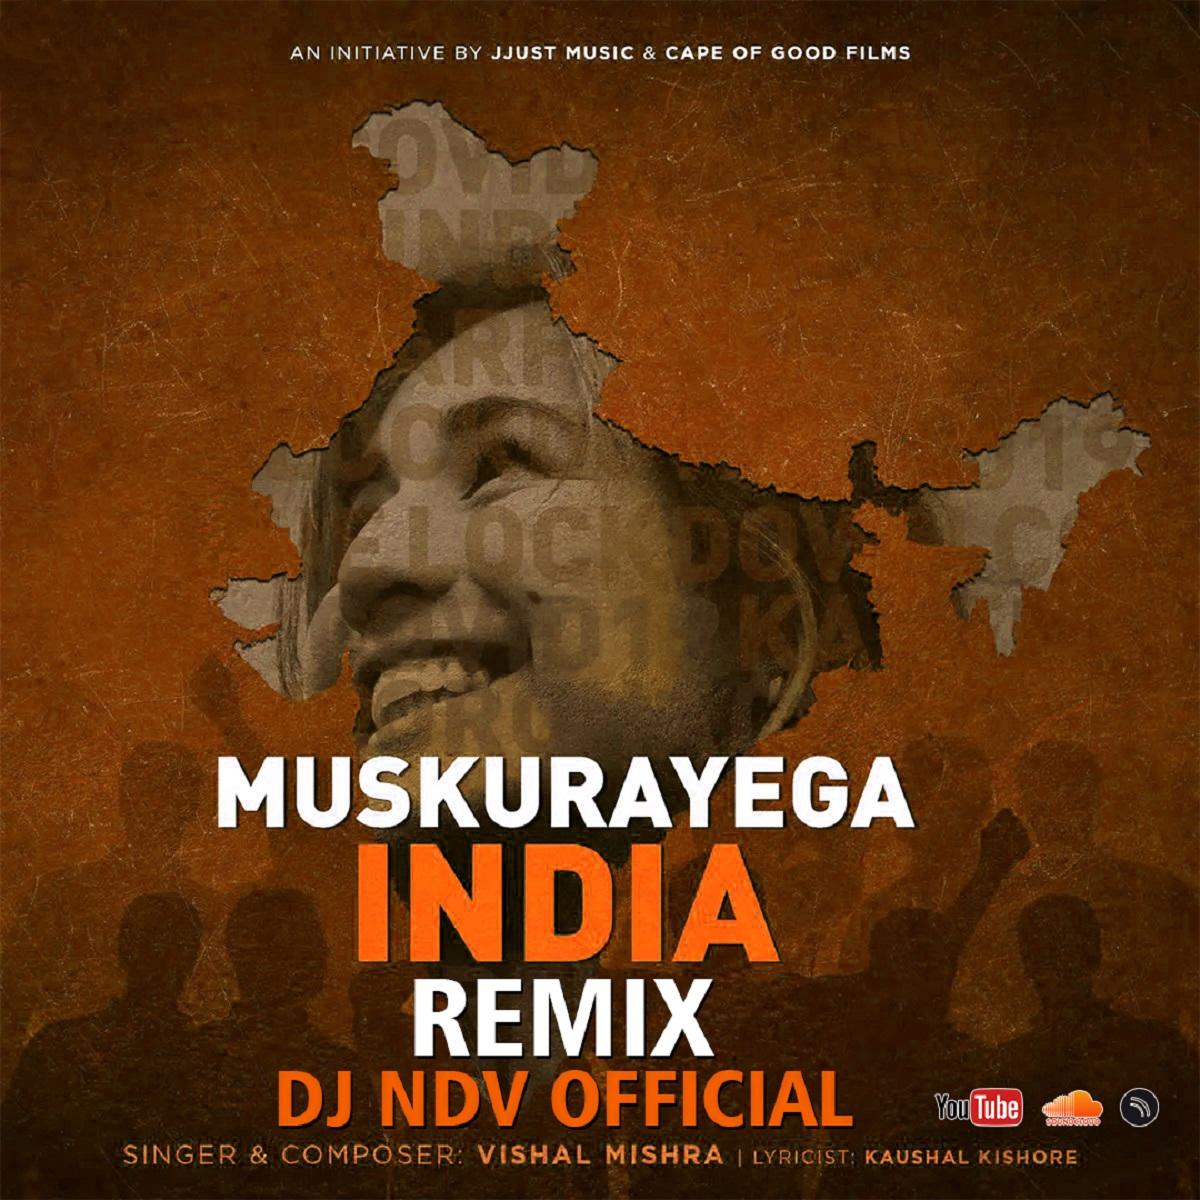 Muskurayega India (Remix) - DJ NDV Official